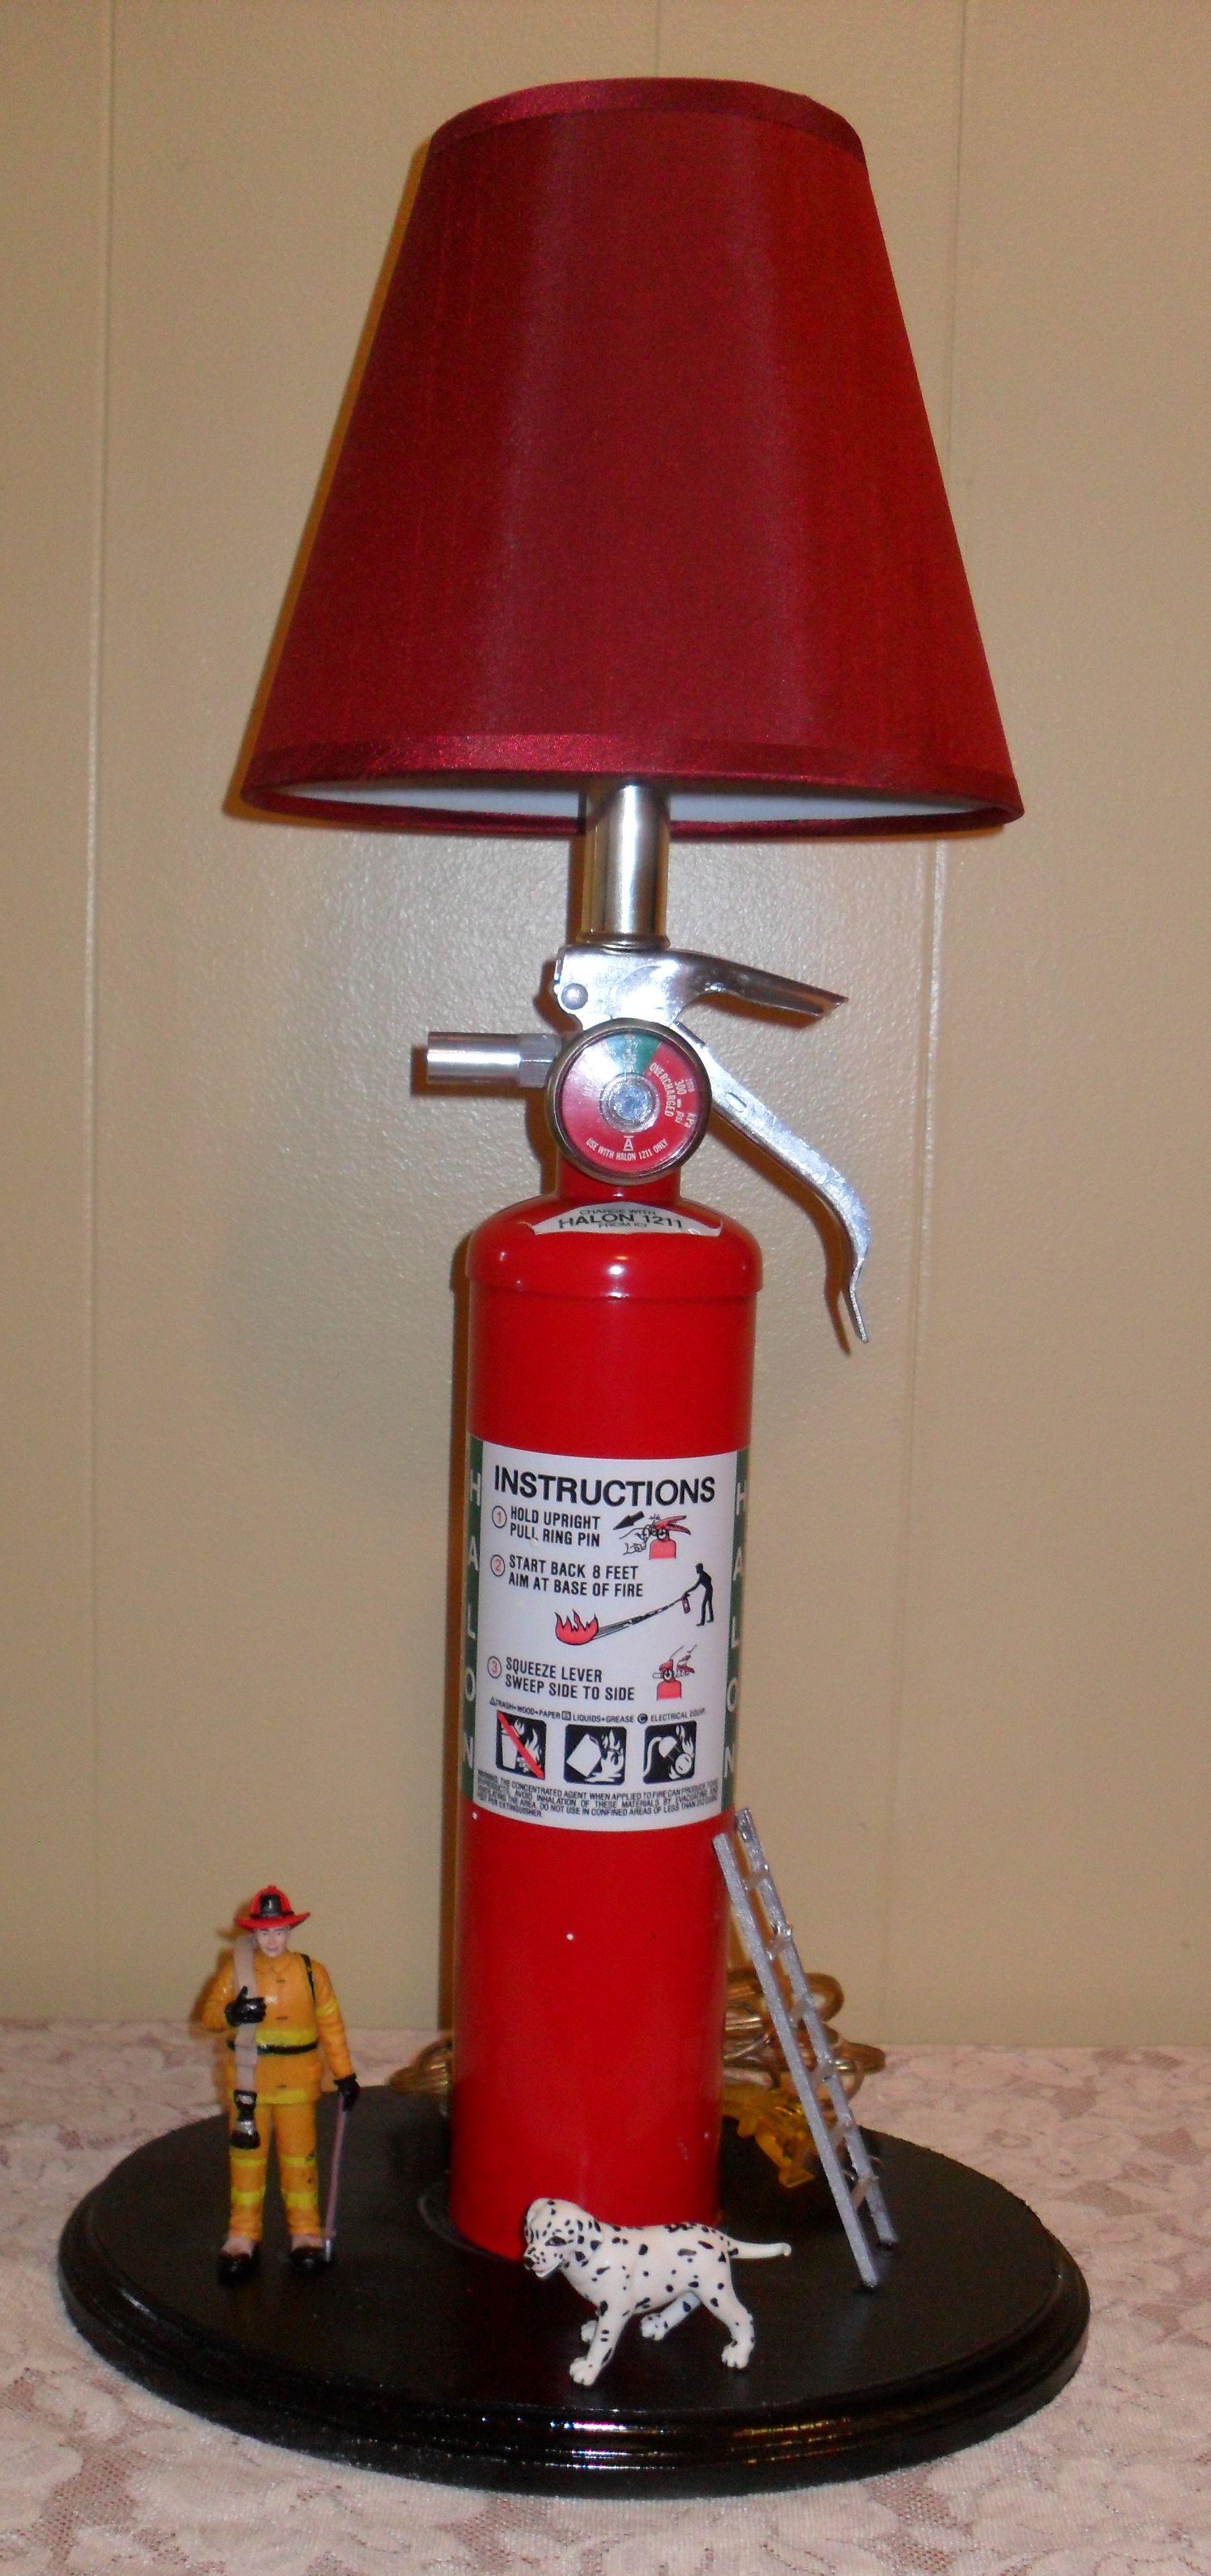 fire extinguisher lamp i made lamps feuerl scher schreibtischlampe lampen. Black Bedroom Furniture Sets. Home Design Ideas